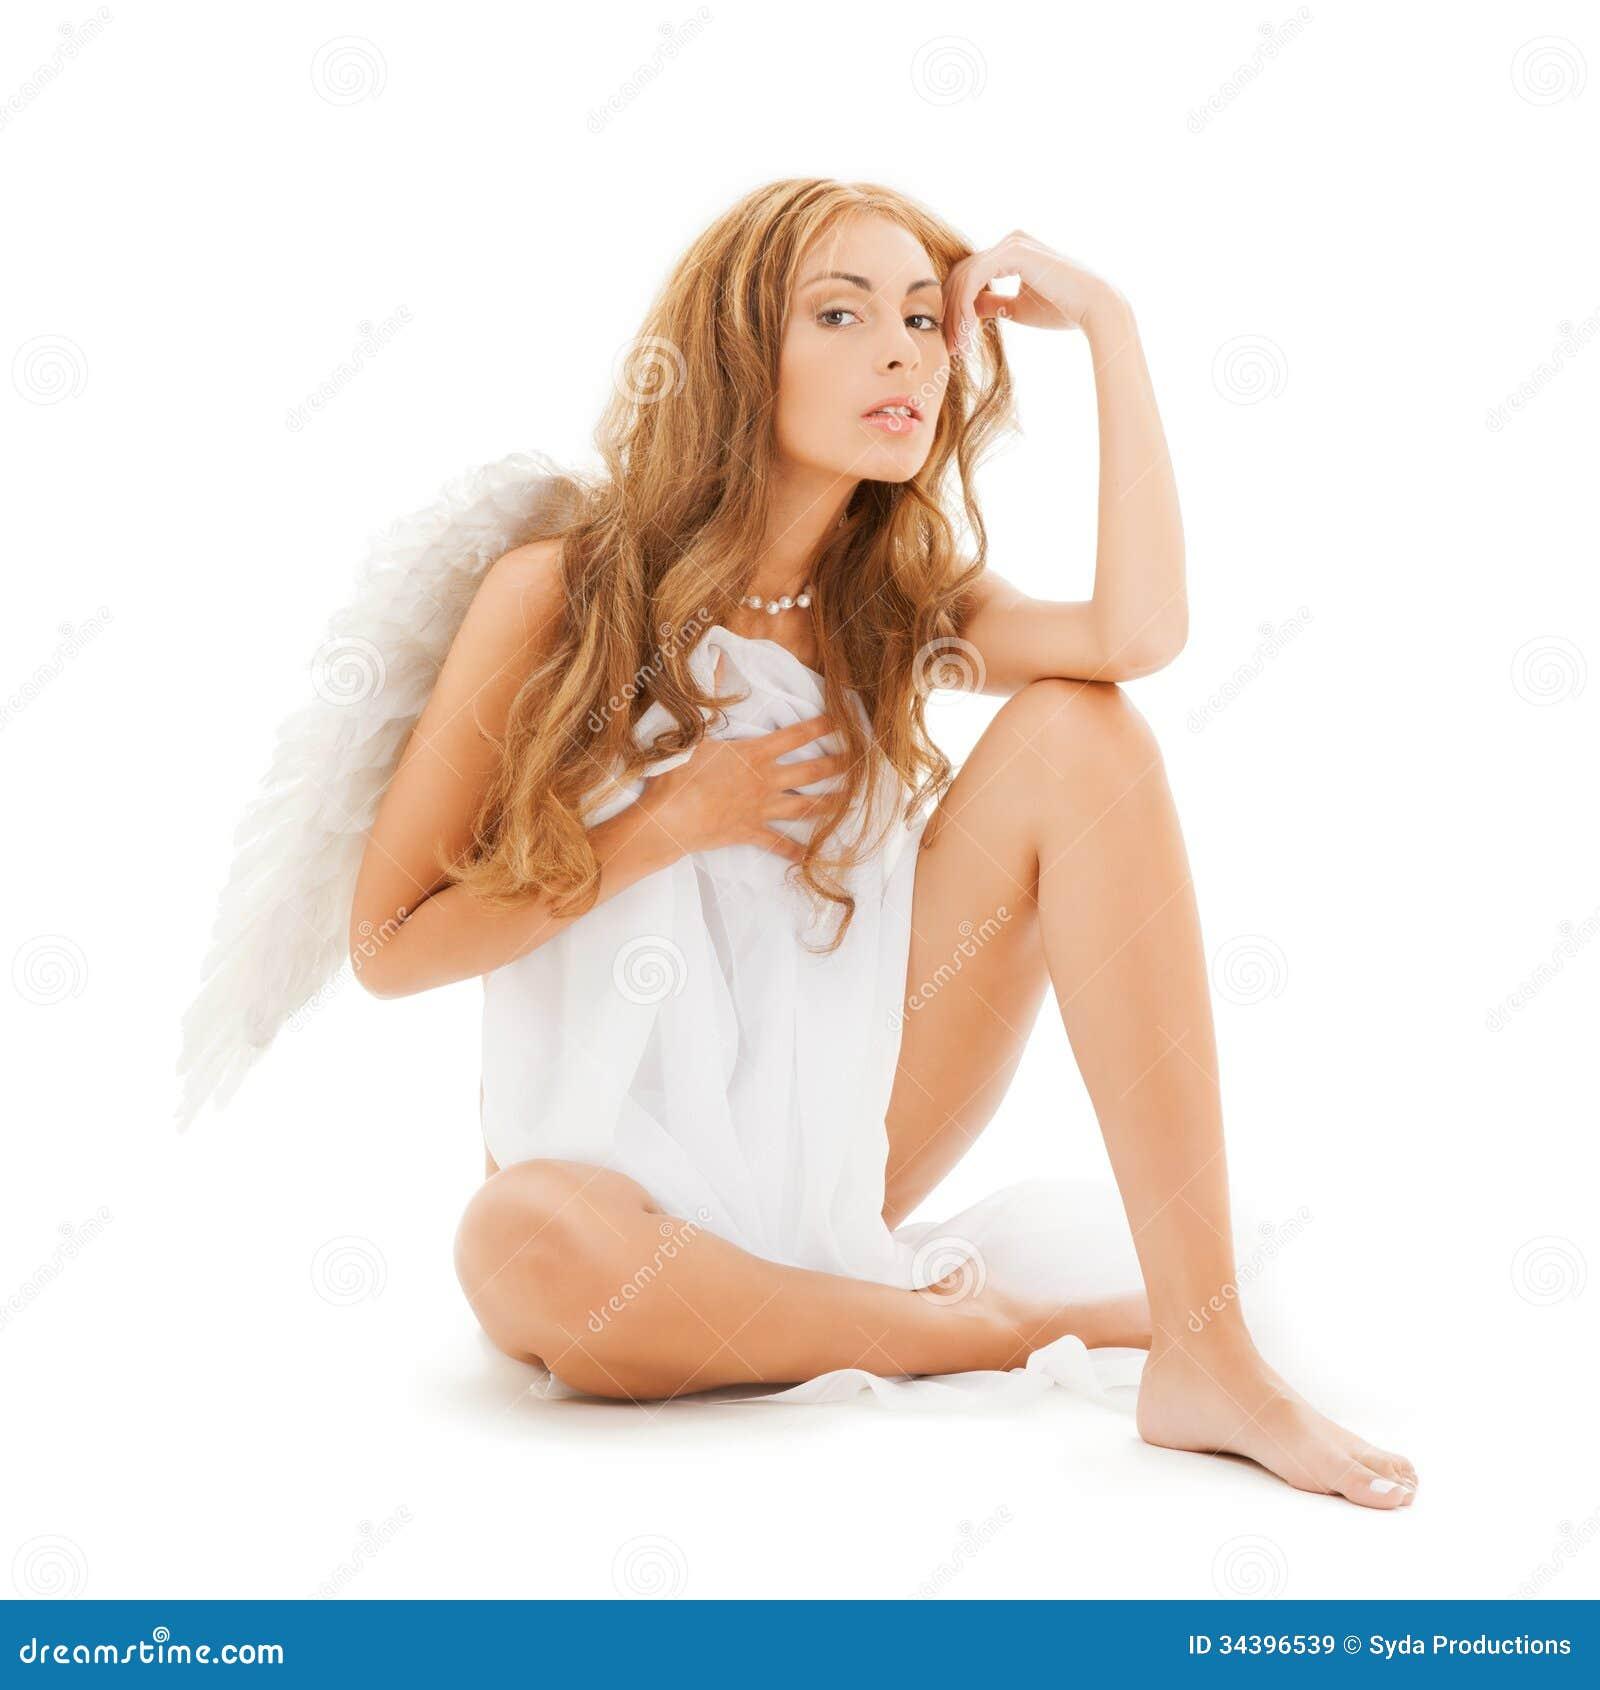 Lsa mujer mas linda foto desnuda 84